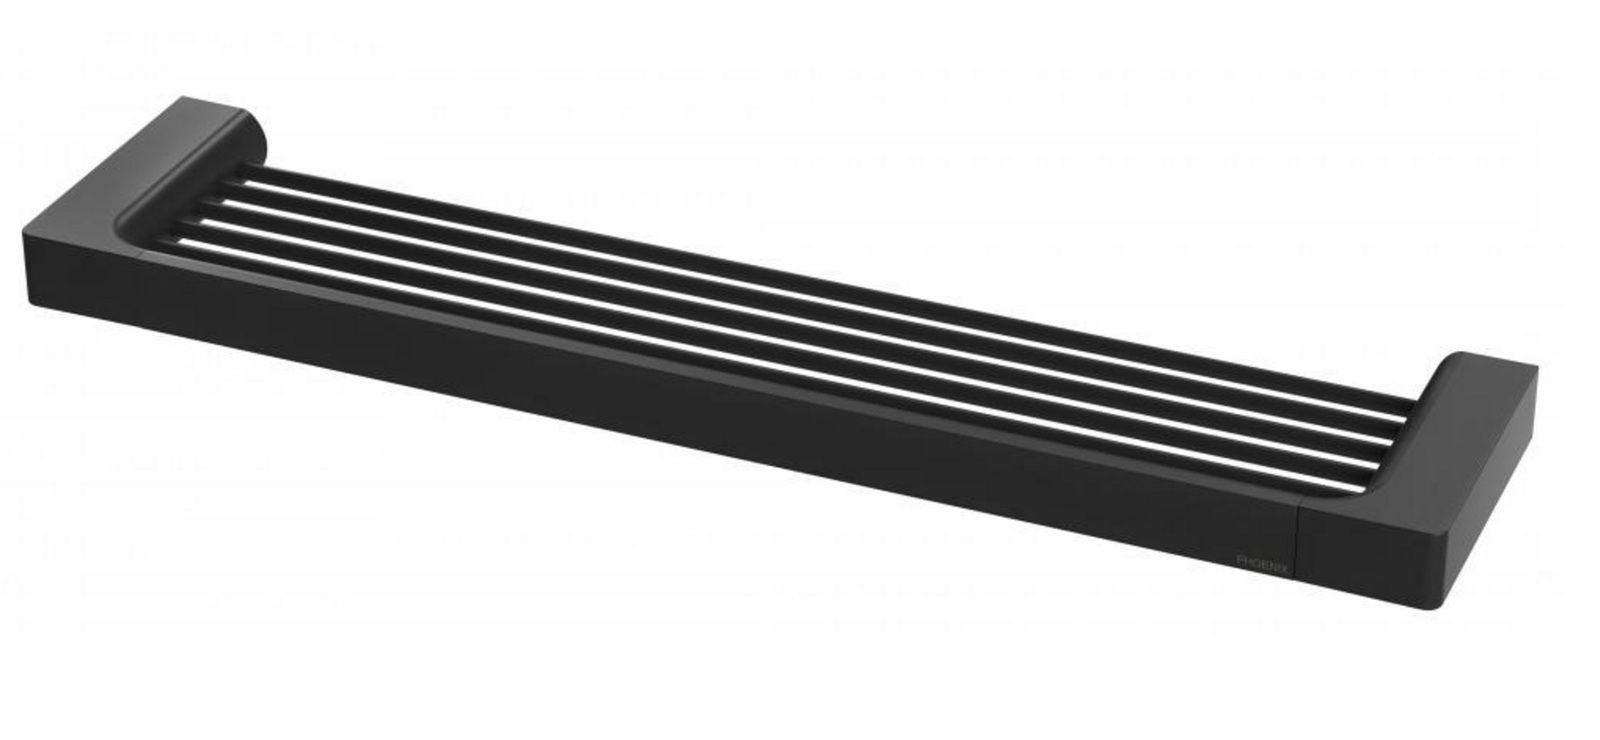 Castano Black Glass Shower Shelf Soap Holder Capri Cagsscb